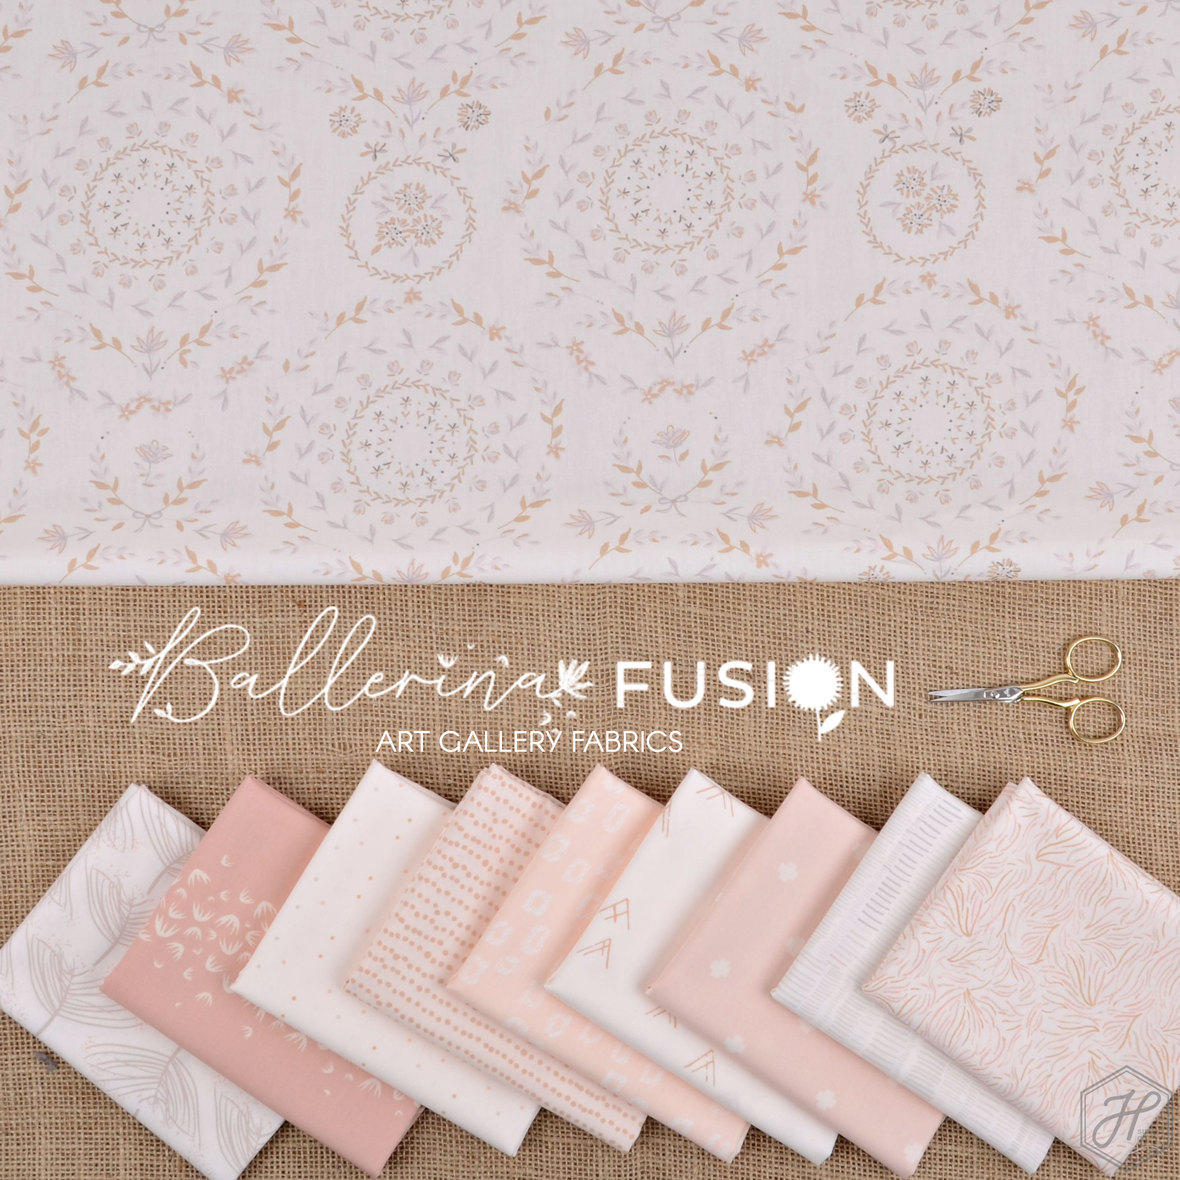 Ballerina-Fusion-Art-Gallery-Fabric-at-Hawthorne-Supply-Co